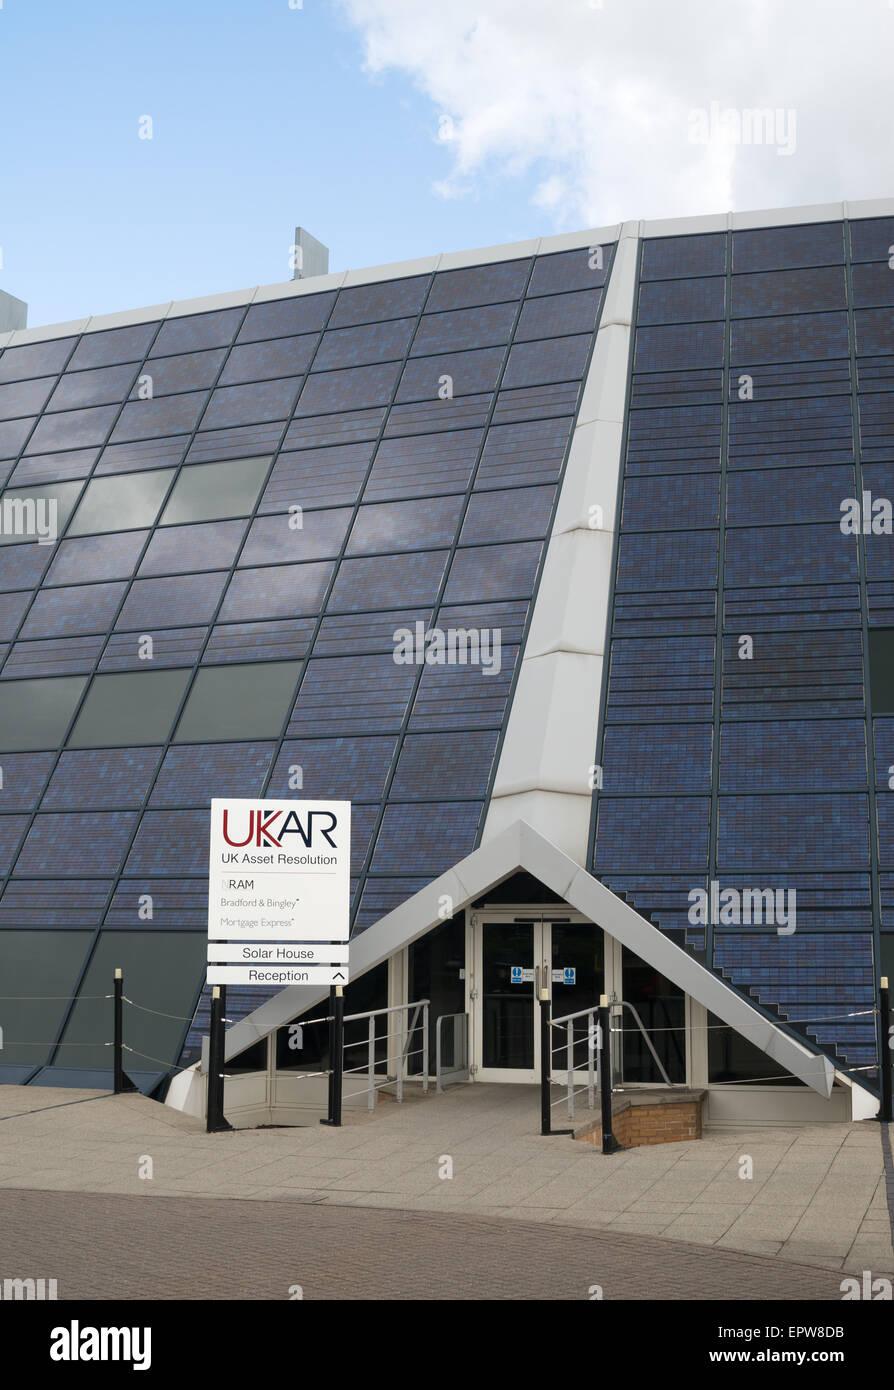 Offices of UK Asset resolution UKAR, Solar House Doxford Park, Sunderland, England, UK - Stock Image